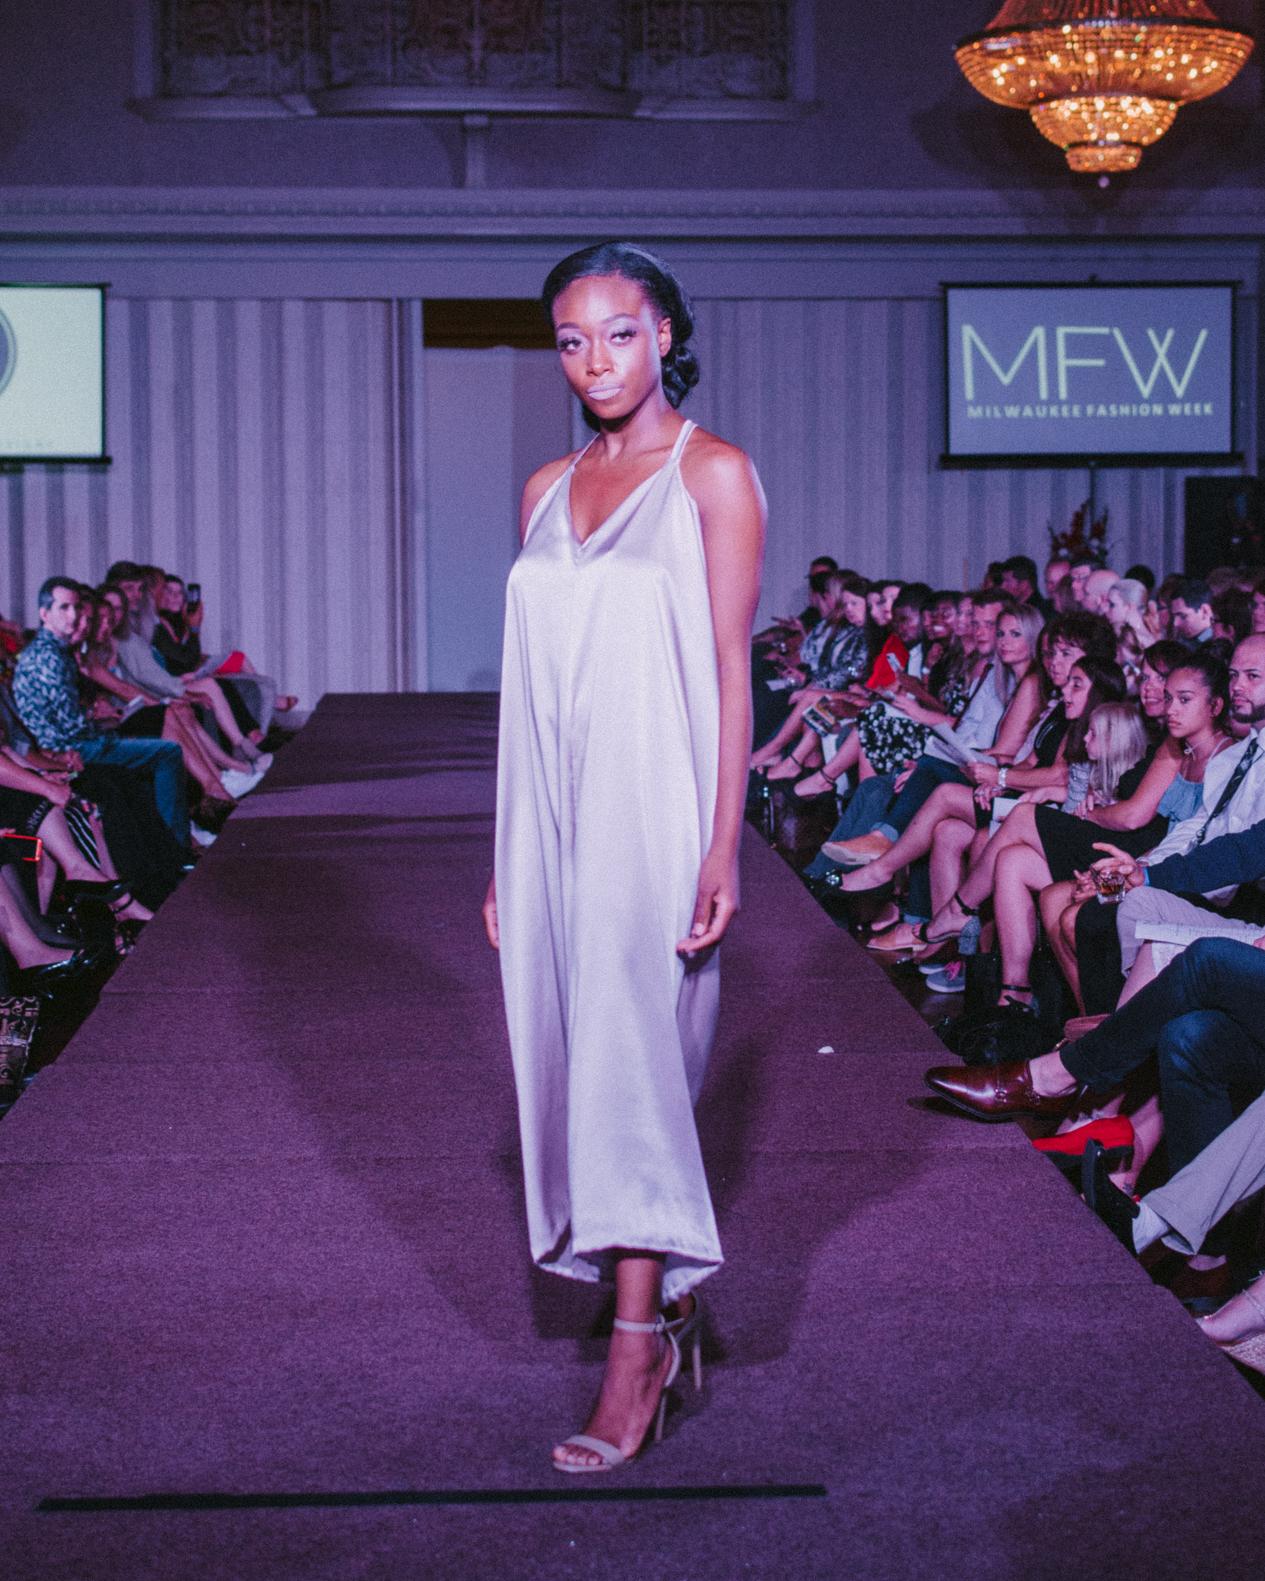 MFW_2017-09-23-6.jpg